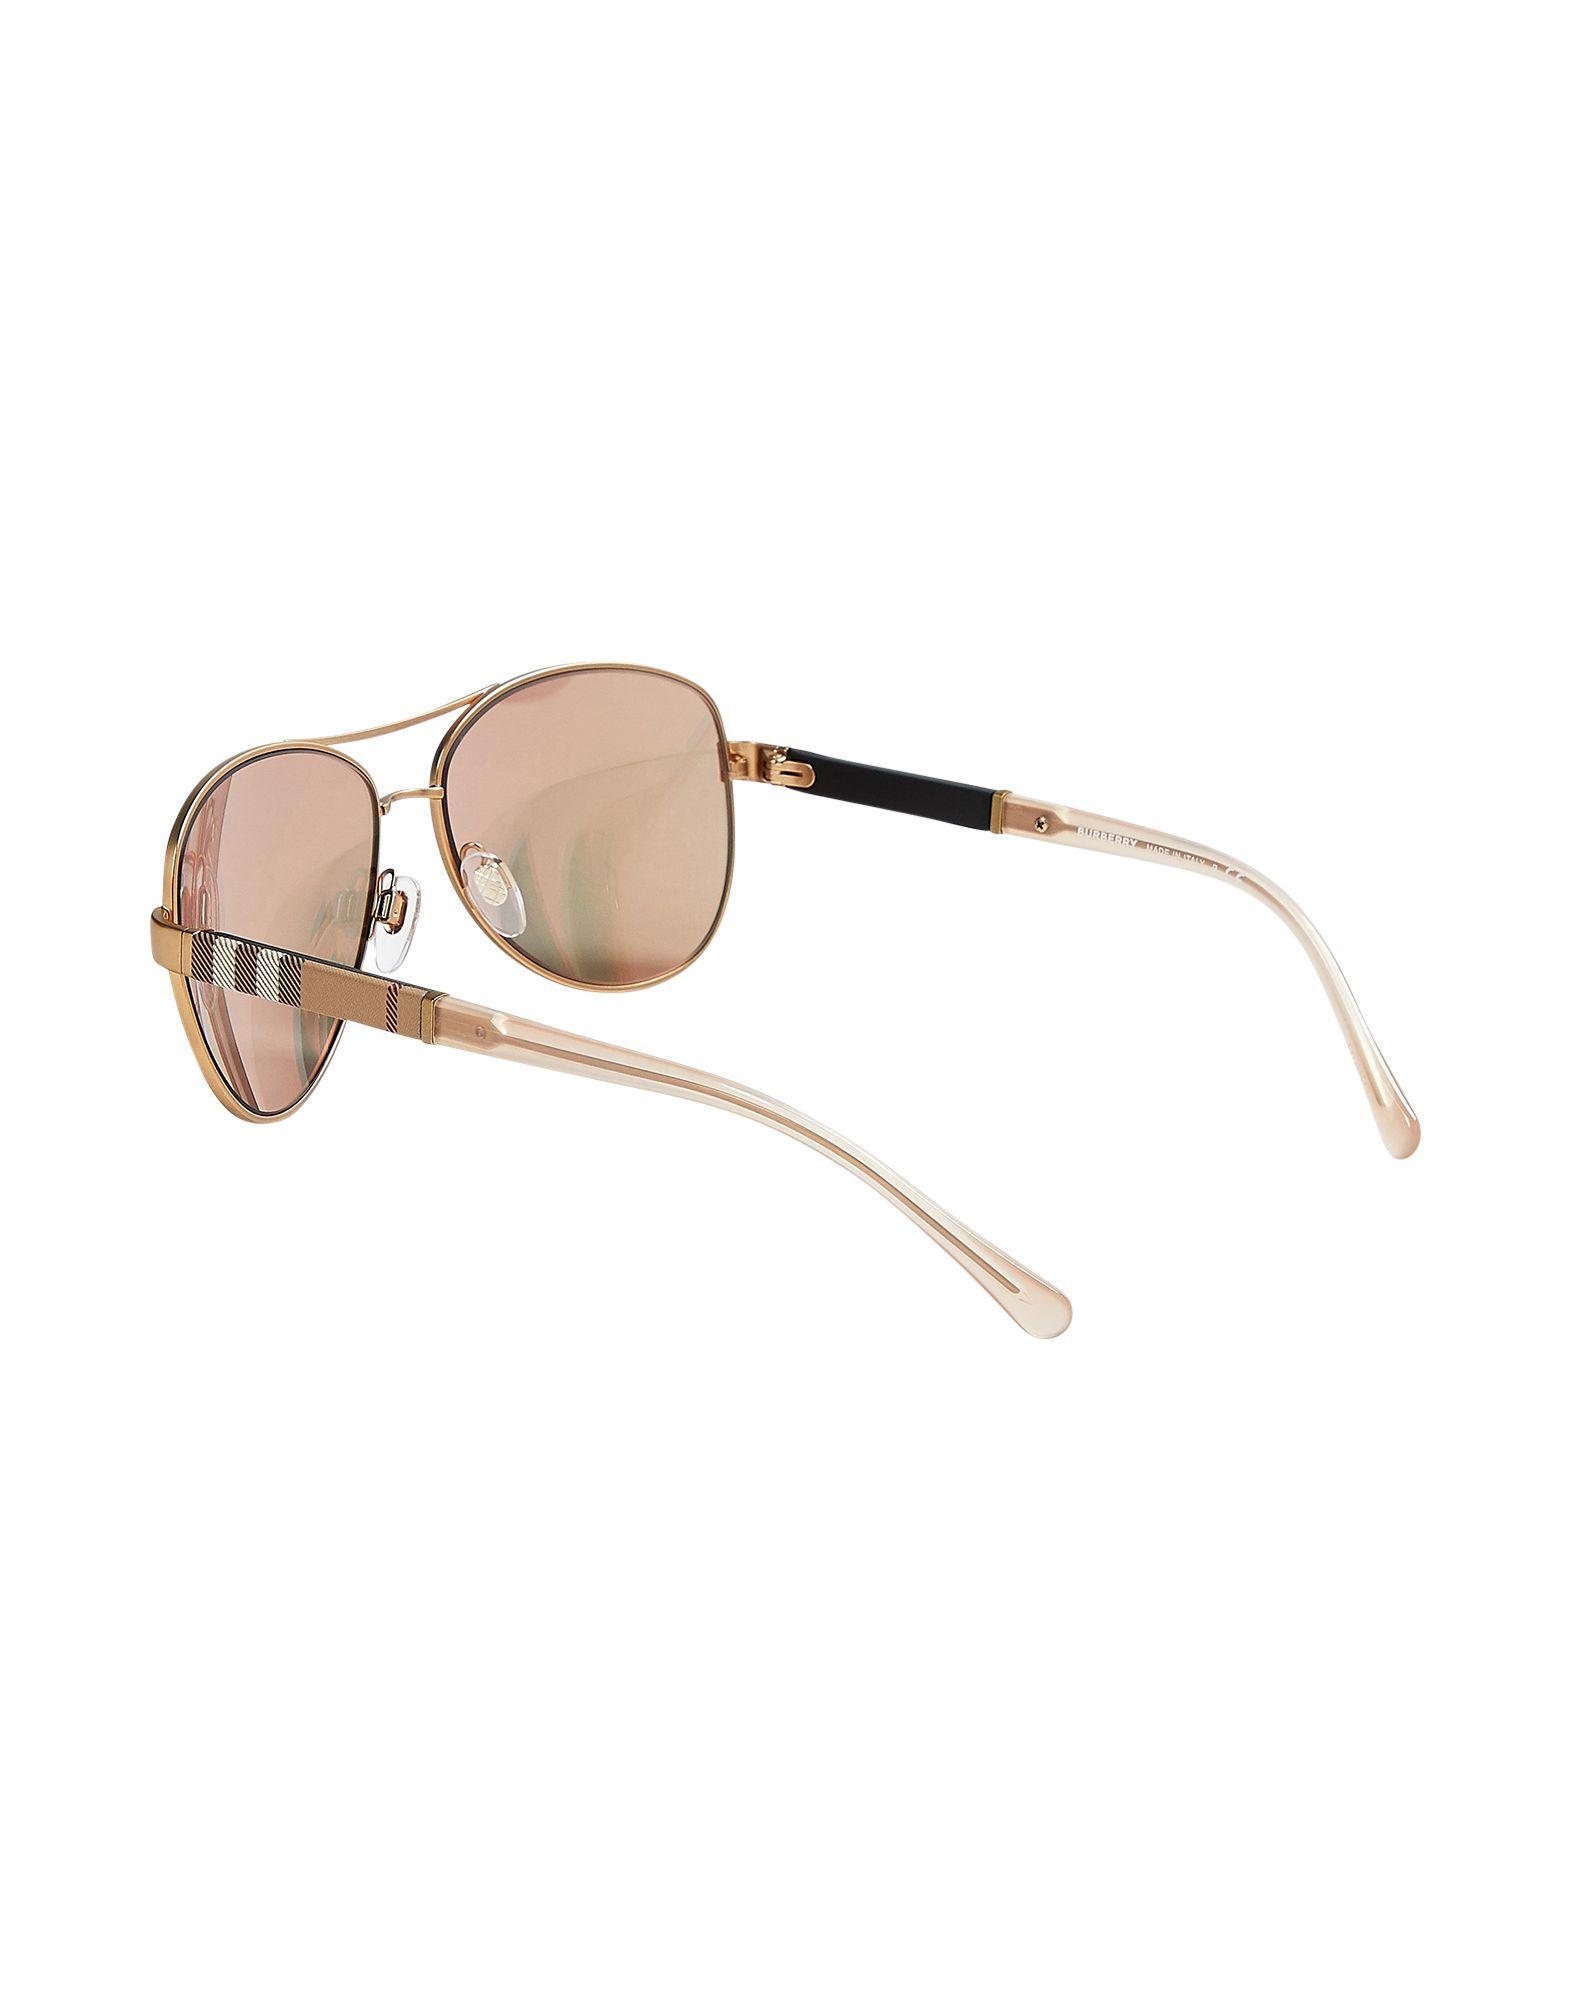 ab5a5efd75e Lyst - Burberry Sunglasses in Metallic